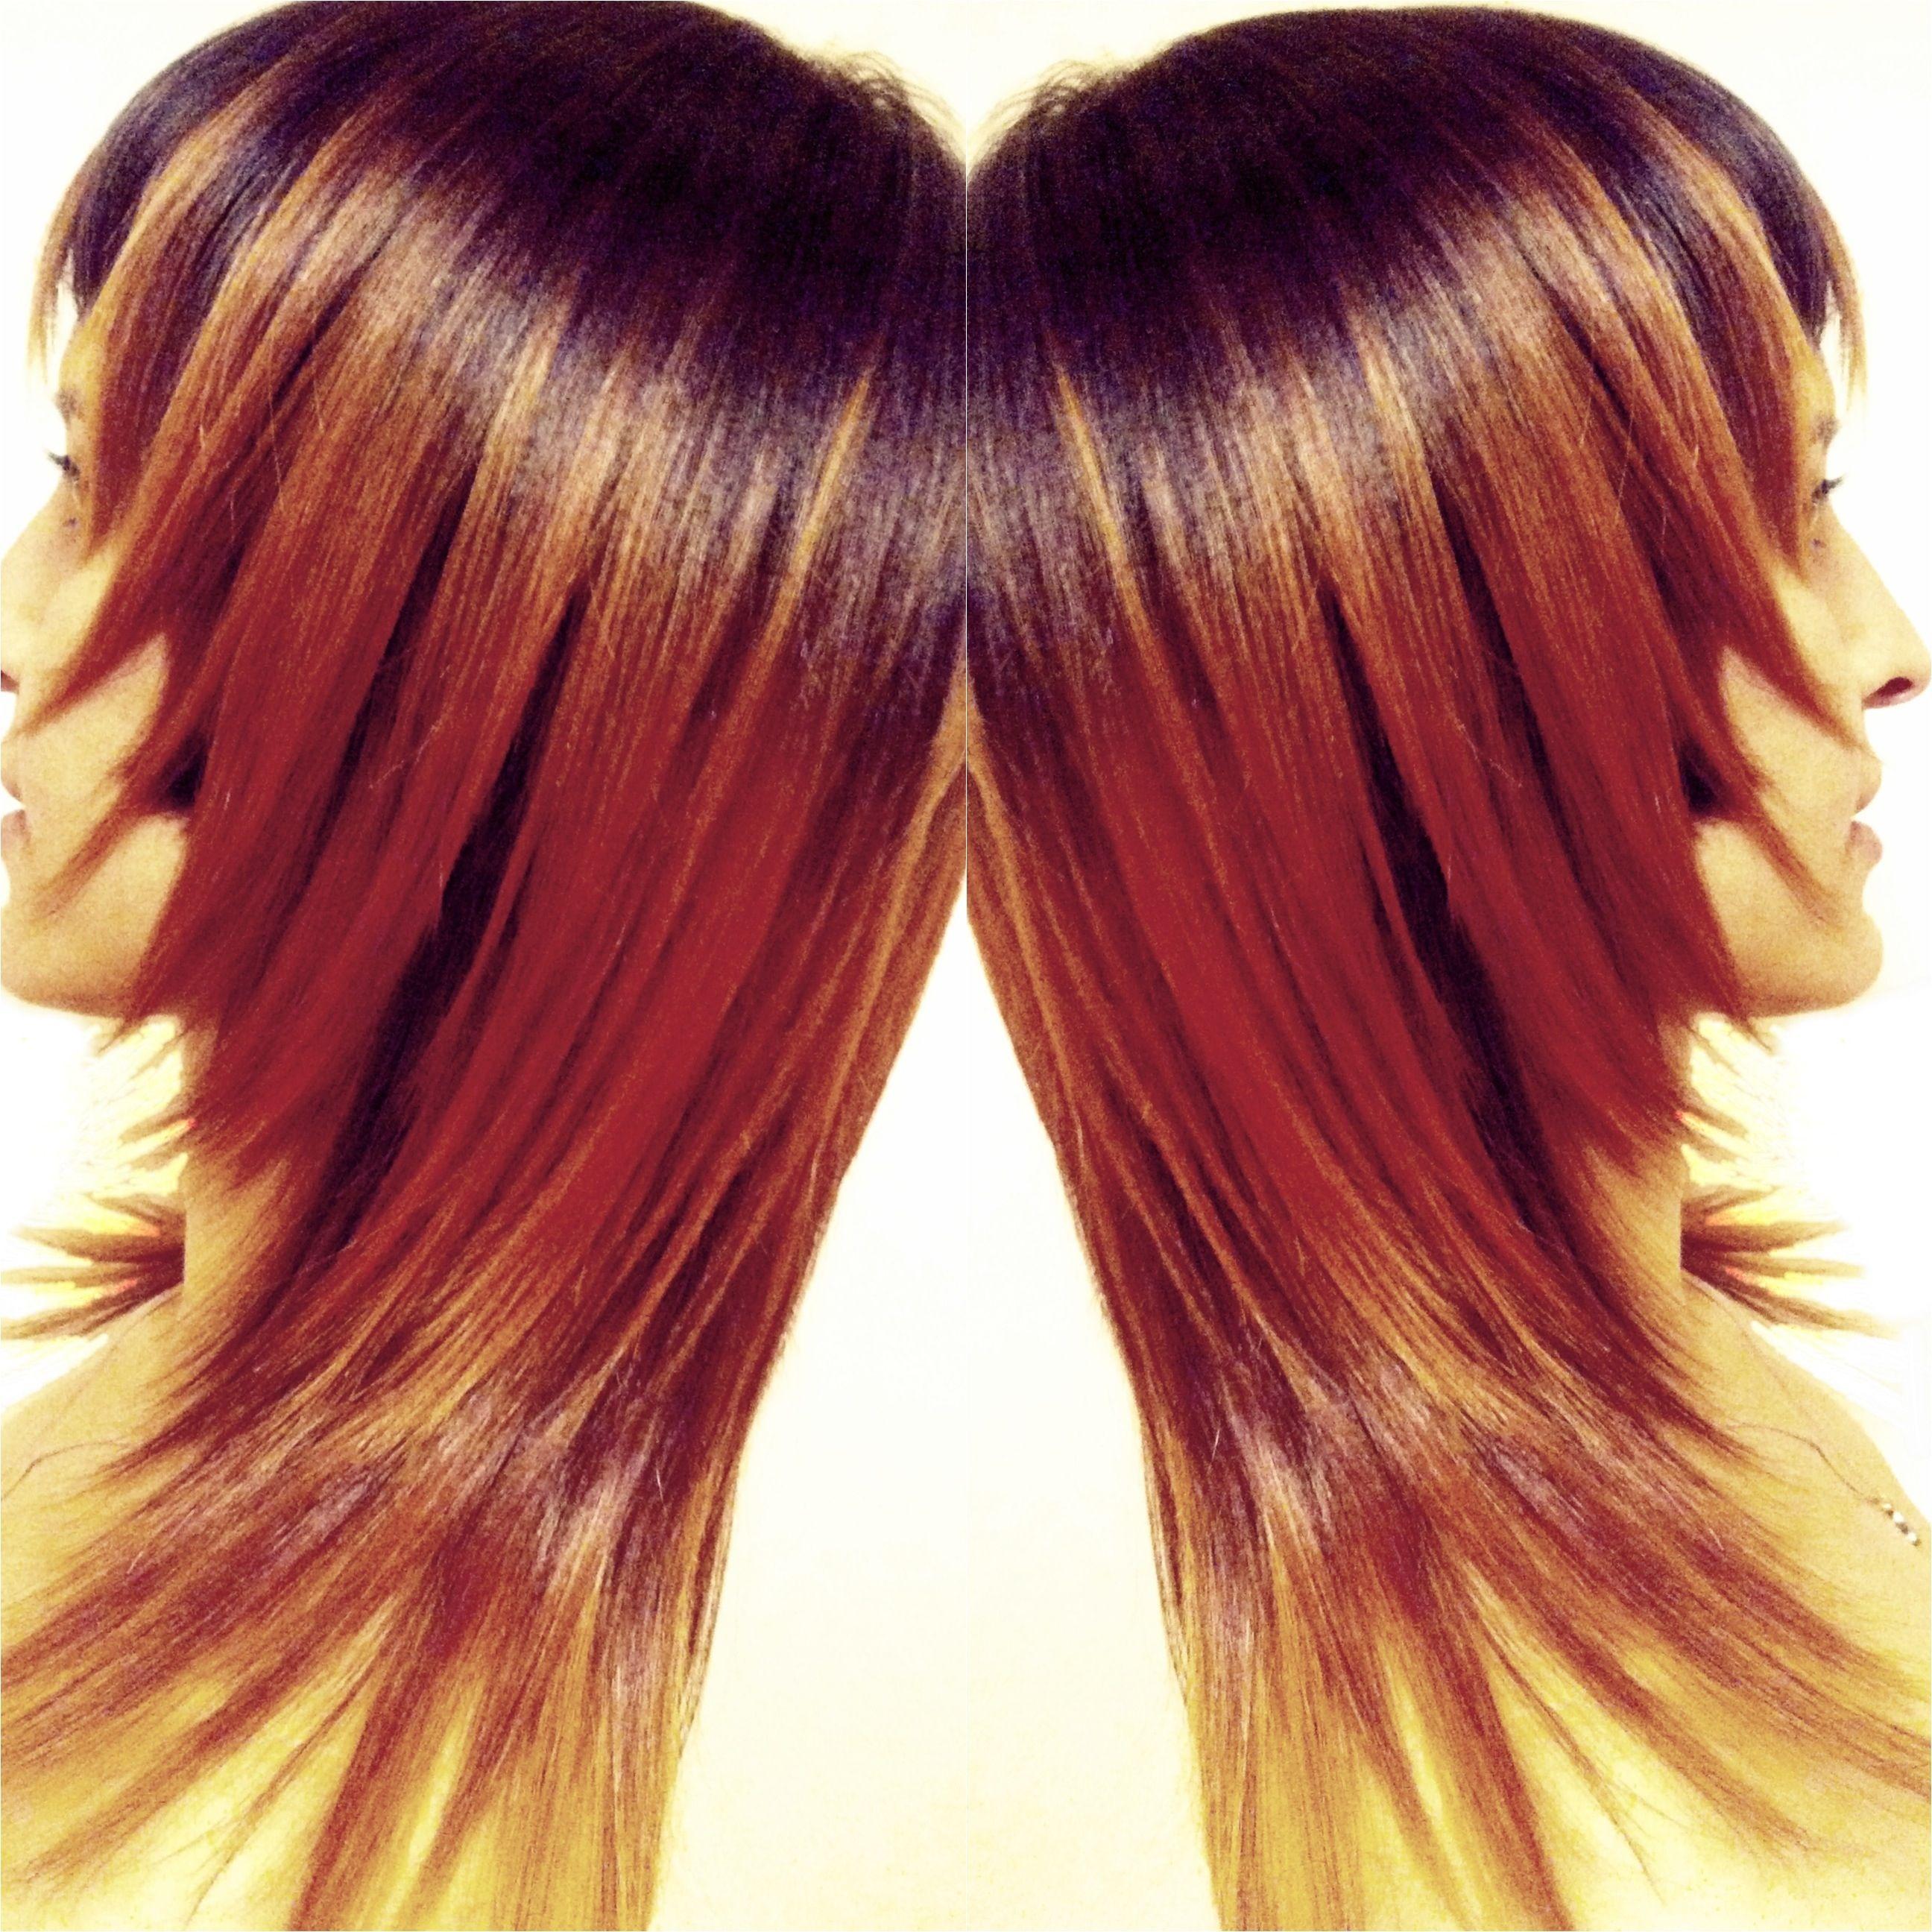 Ombr Hair Color Hair Cut Epic Hair Movement Ira Pope Sage Hair